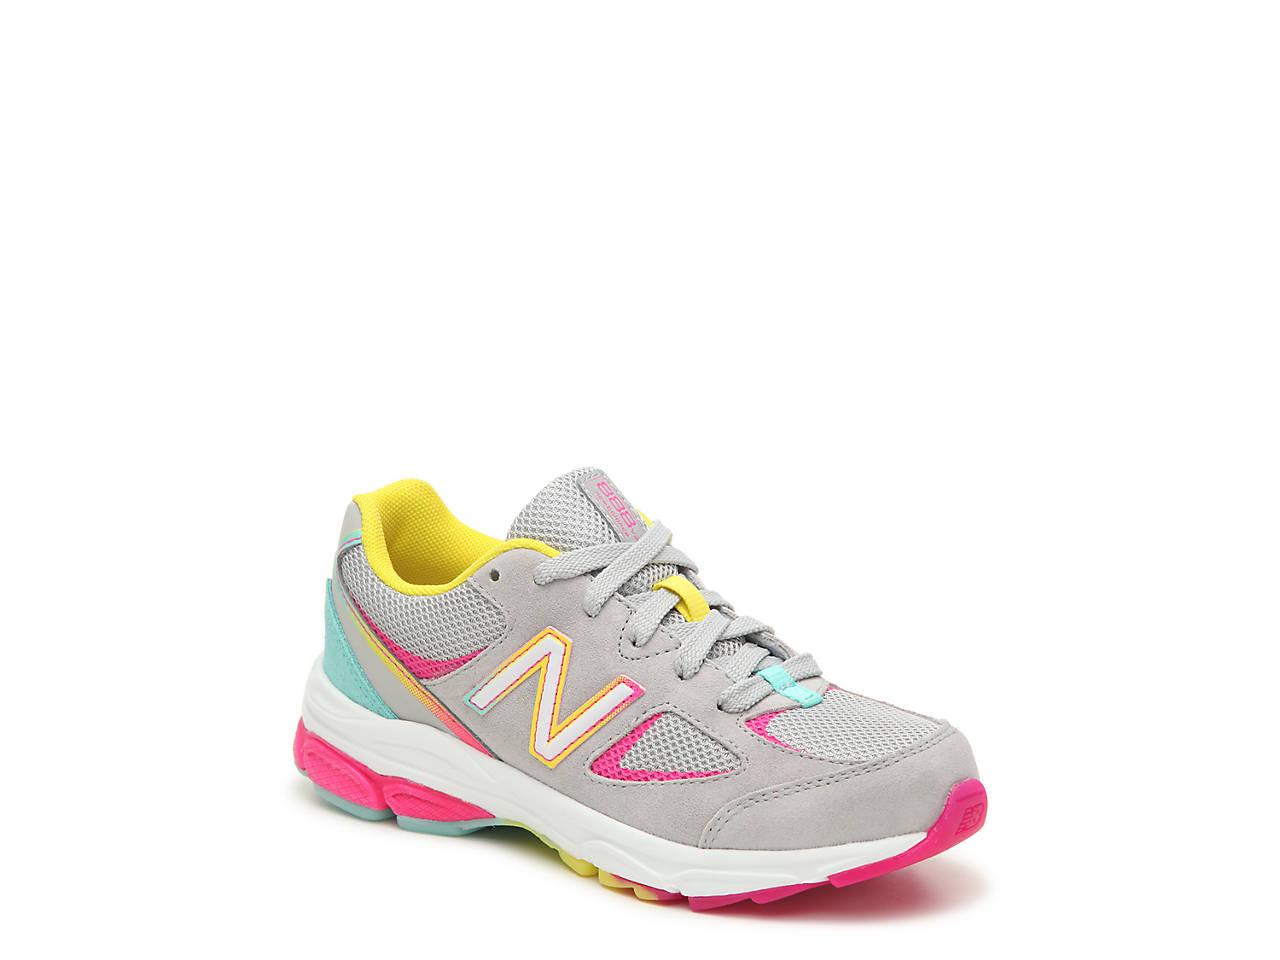 cefe01e7 New Balance 888 v2 Sneaker - Kids' Kids Shoes | DSW